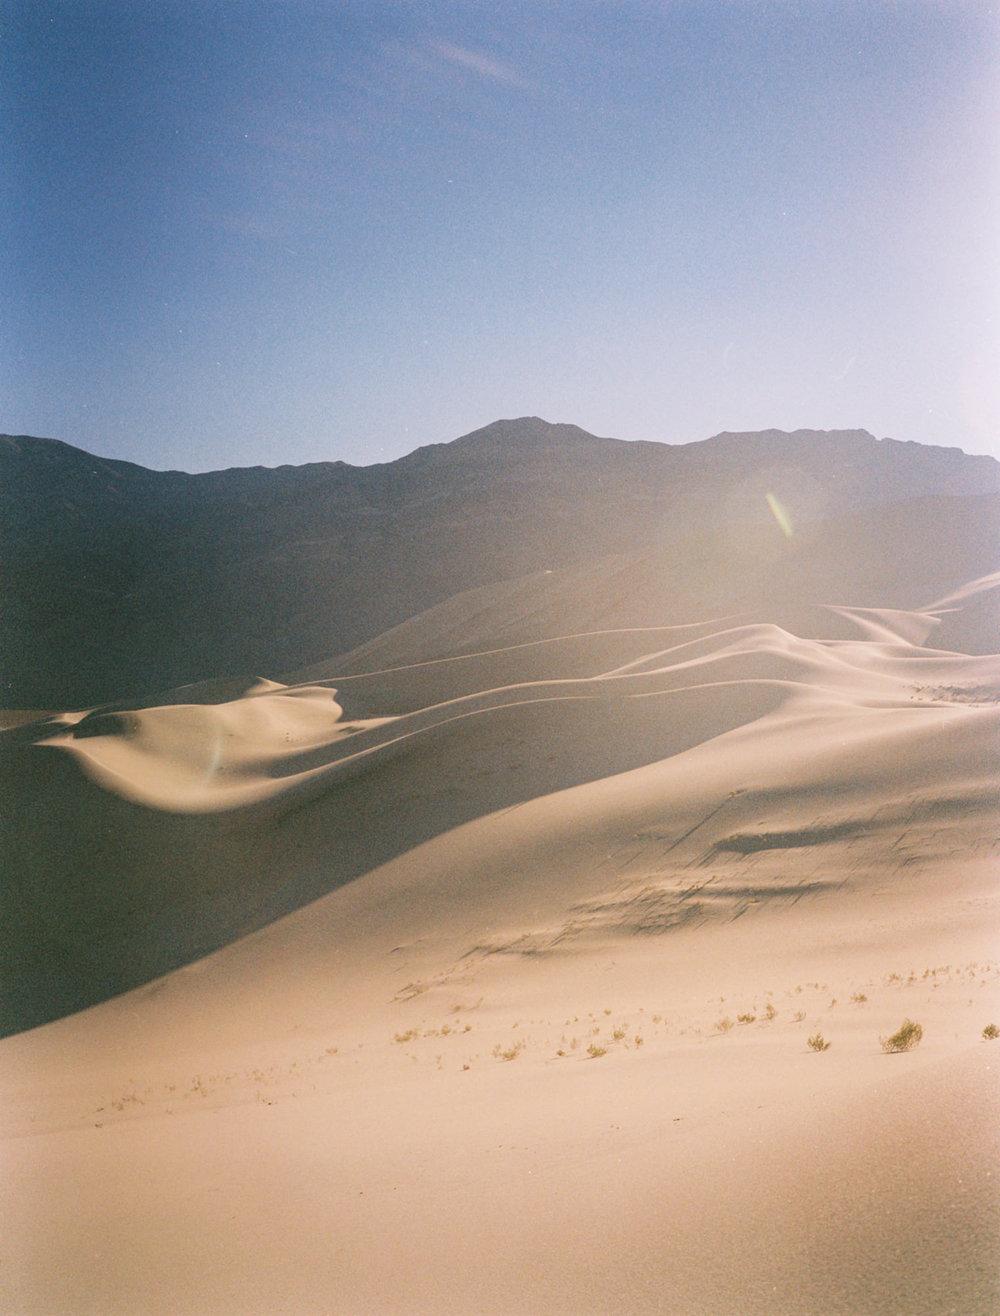 desert-camping-fujiGA645zi-22.jpg